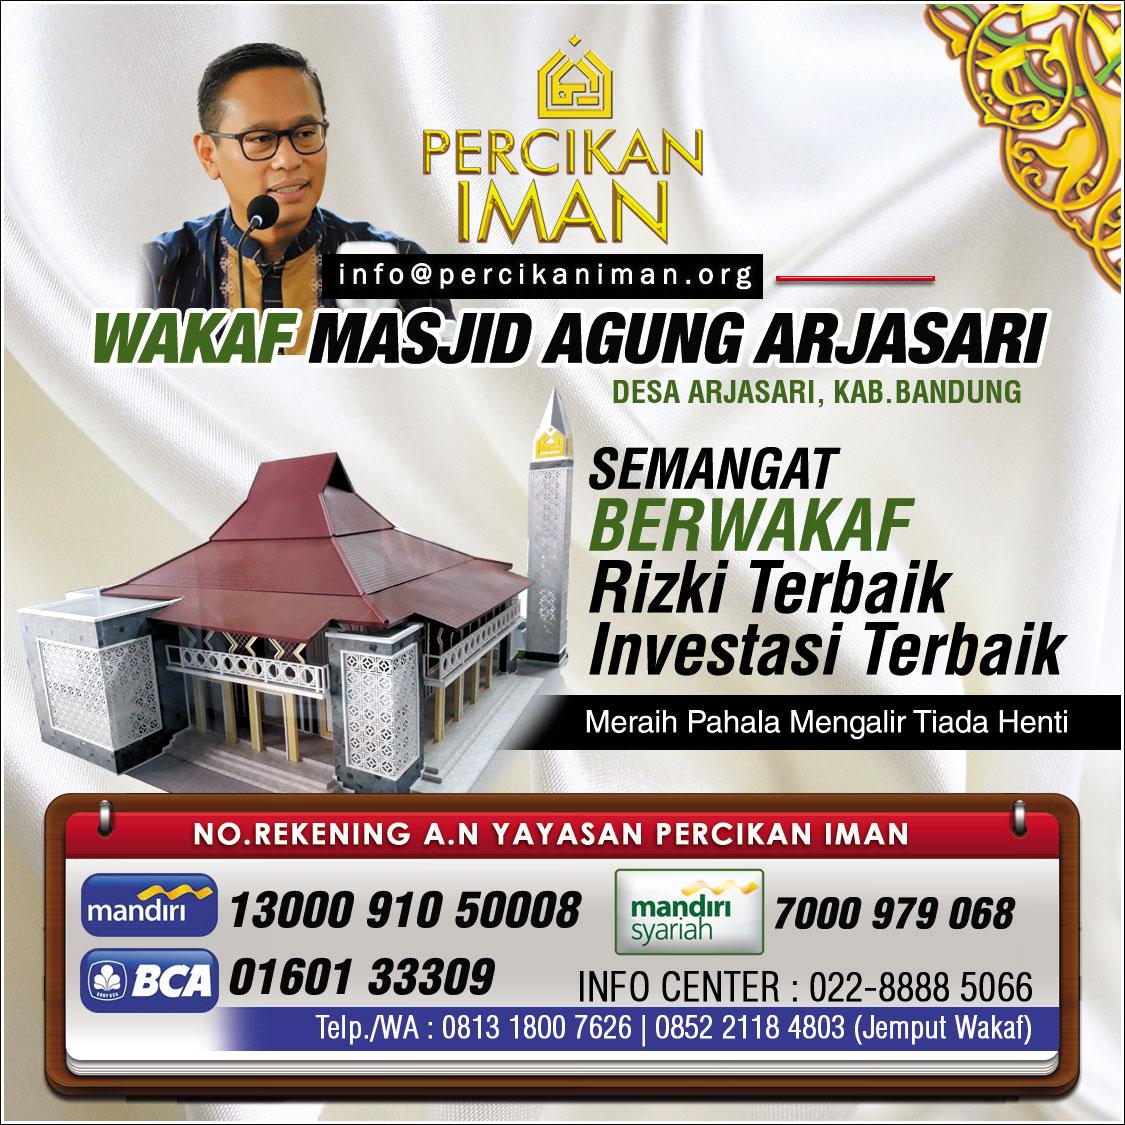 artikel-wakaf-masjid-agung-arjasari-percikan-iman